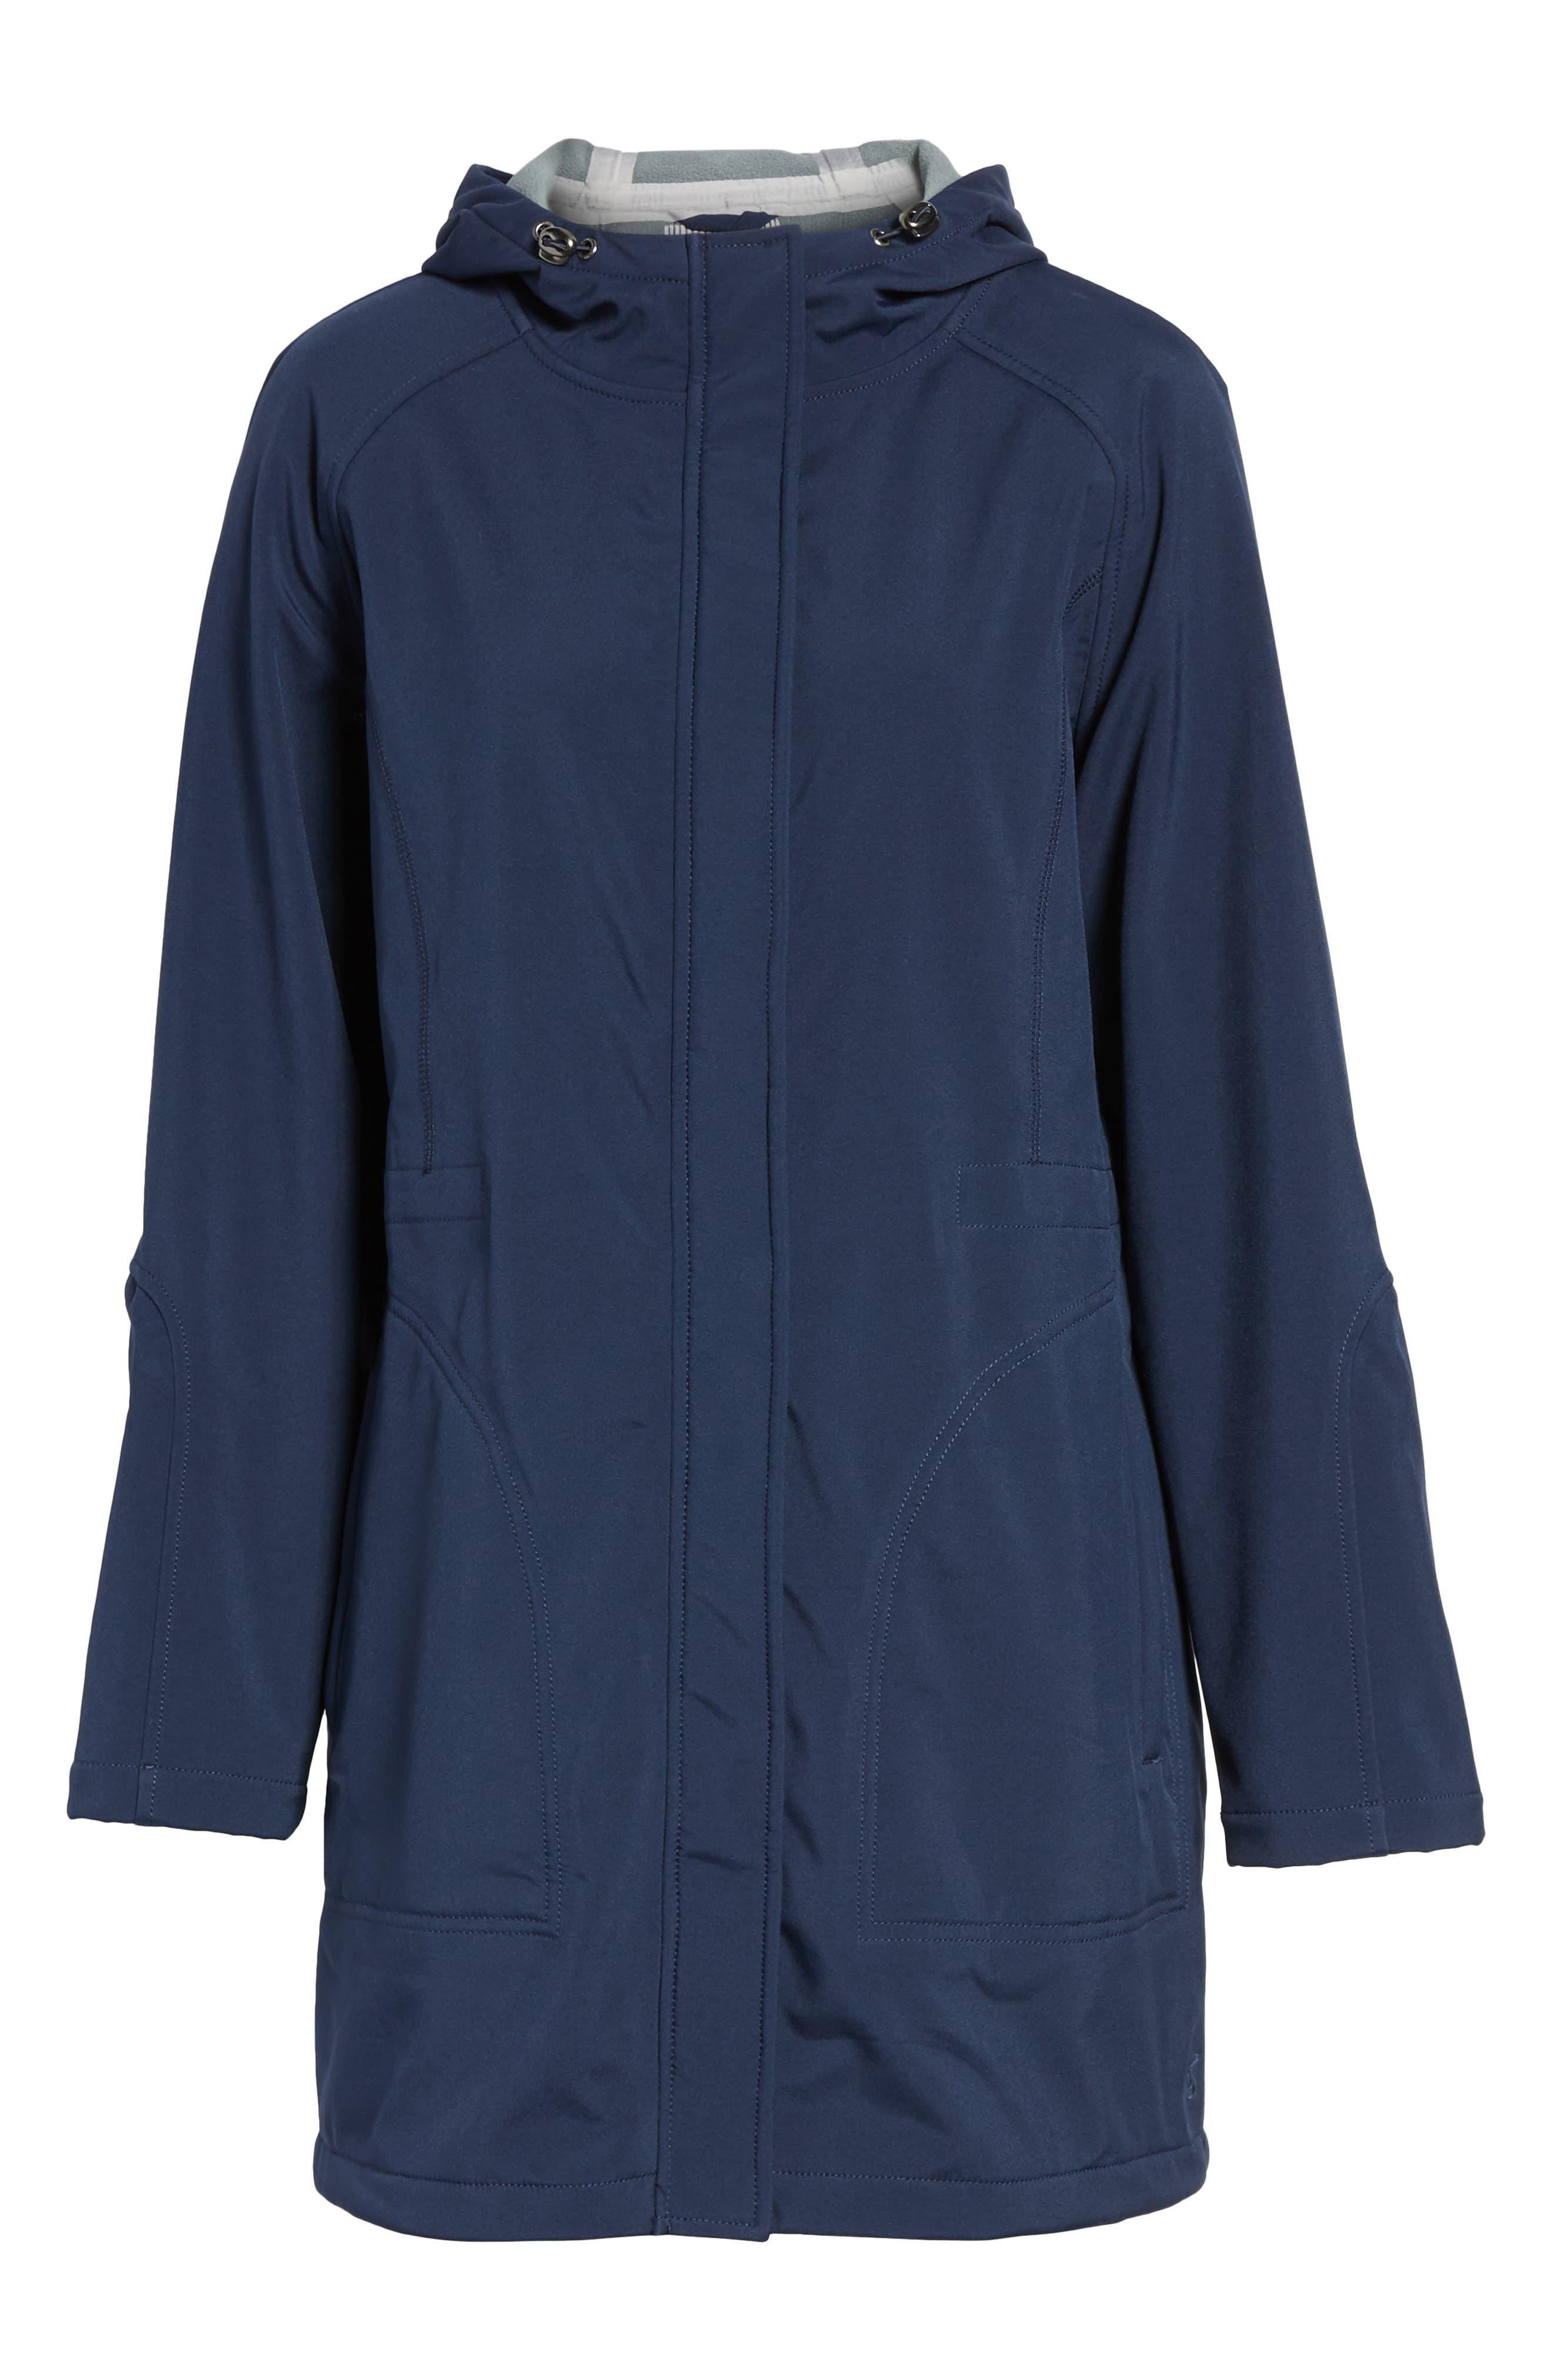 Right as Rain Fleece Lined Raincoat,                             Alternate thumbnail 14, color,